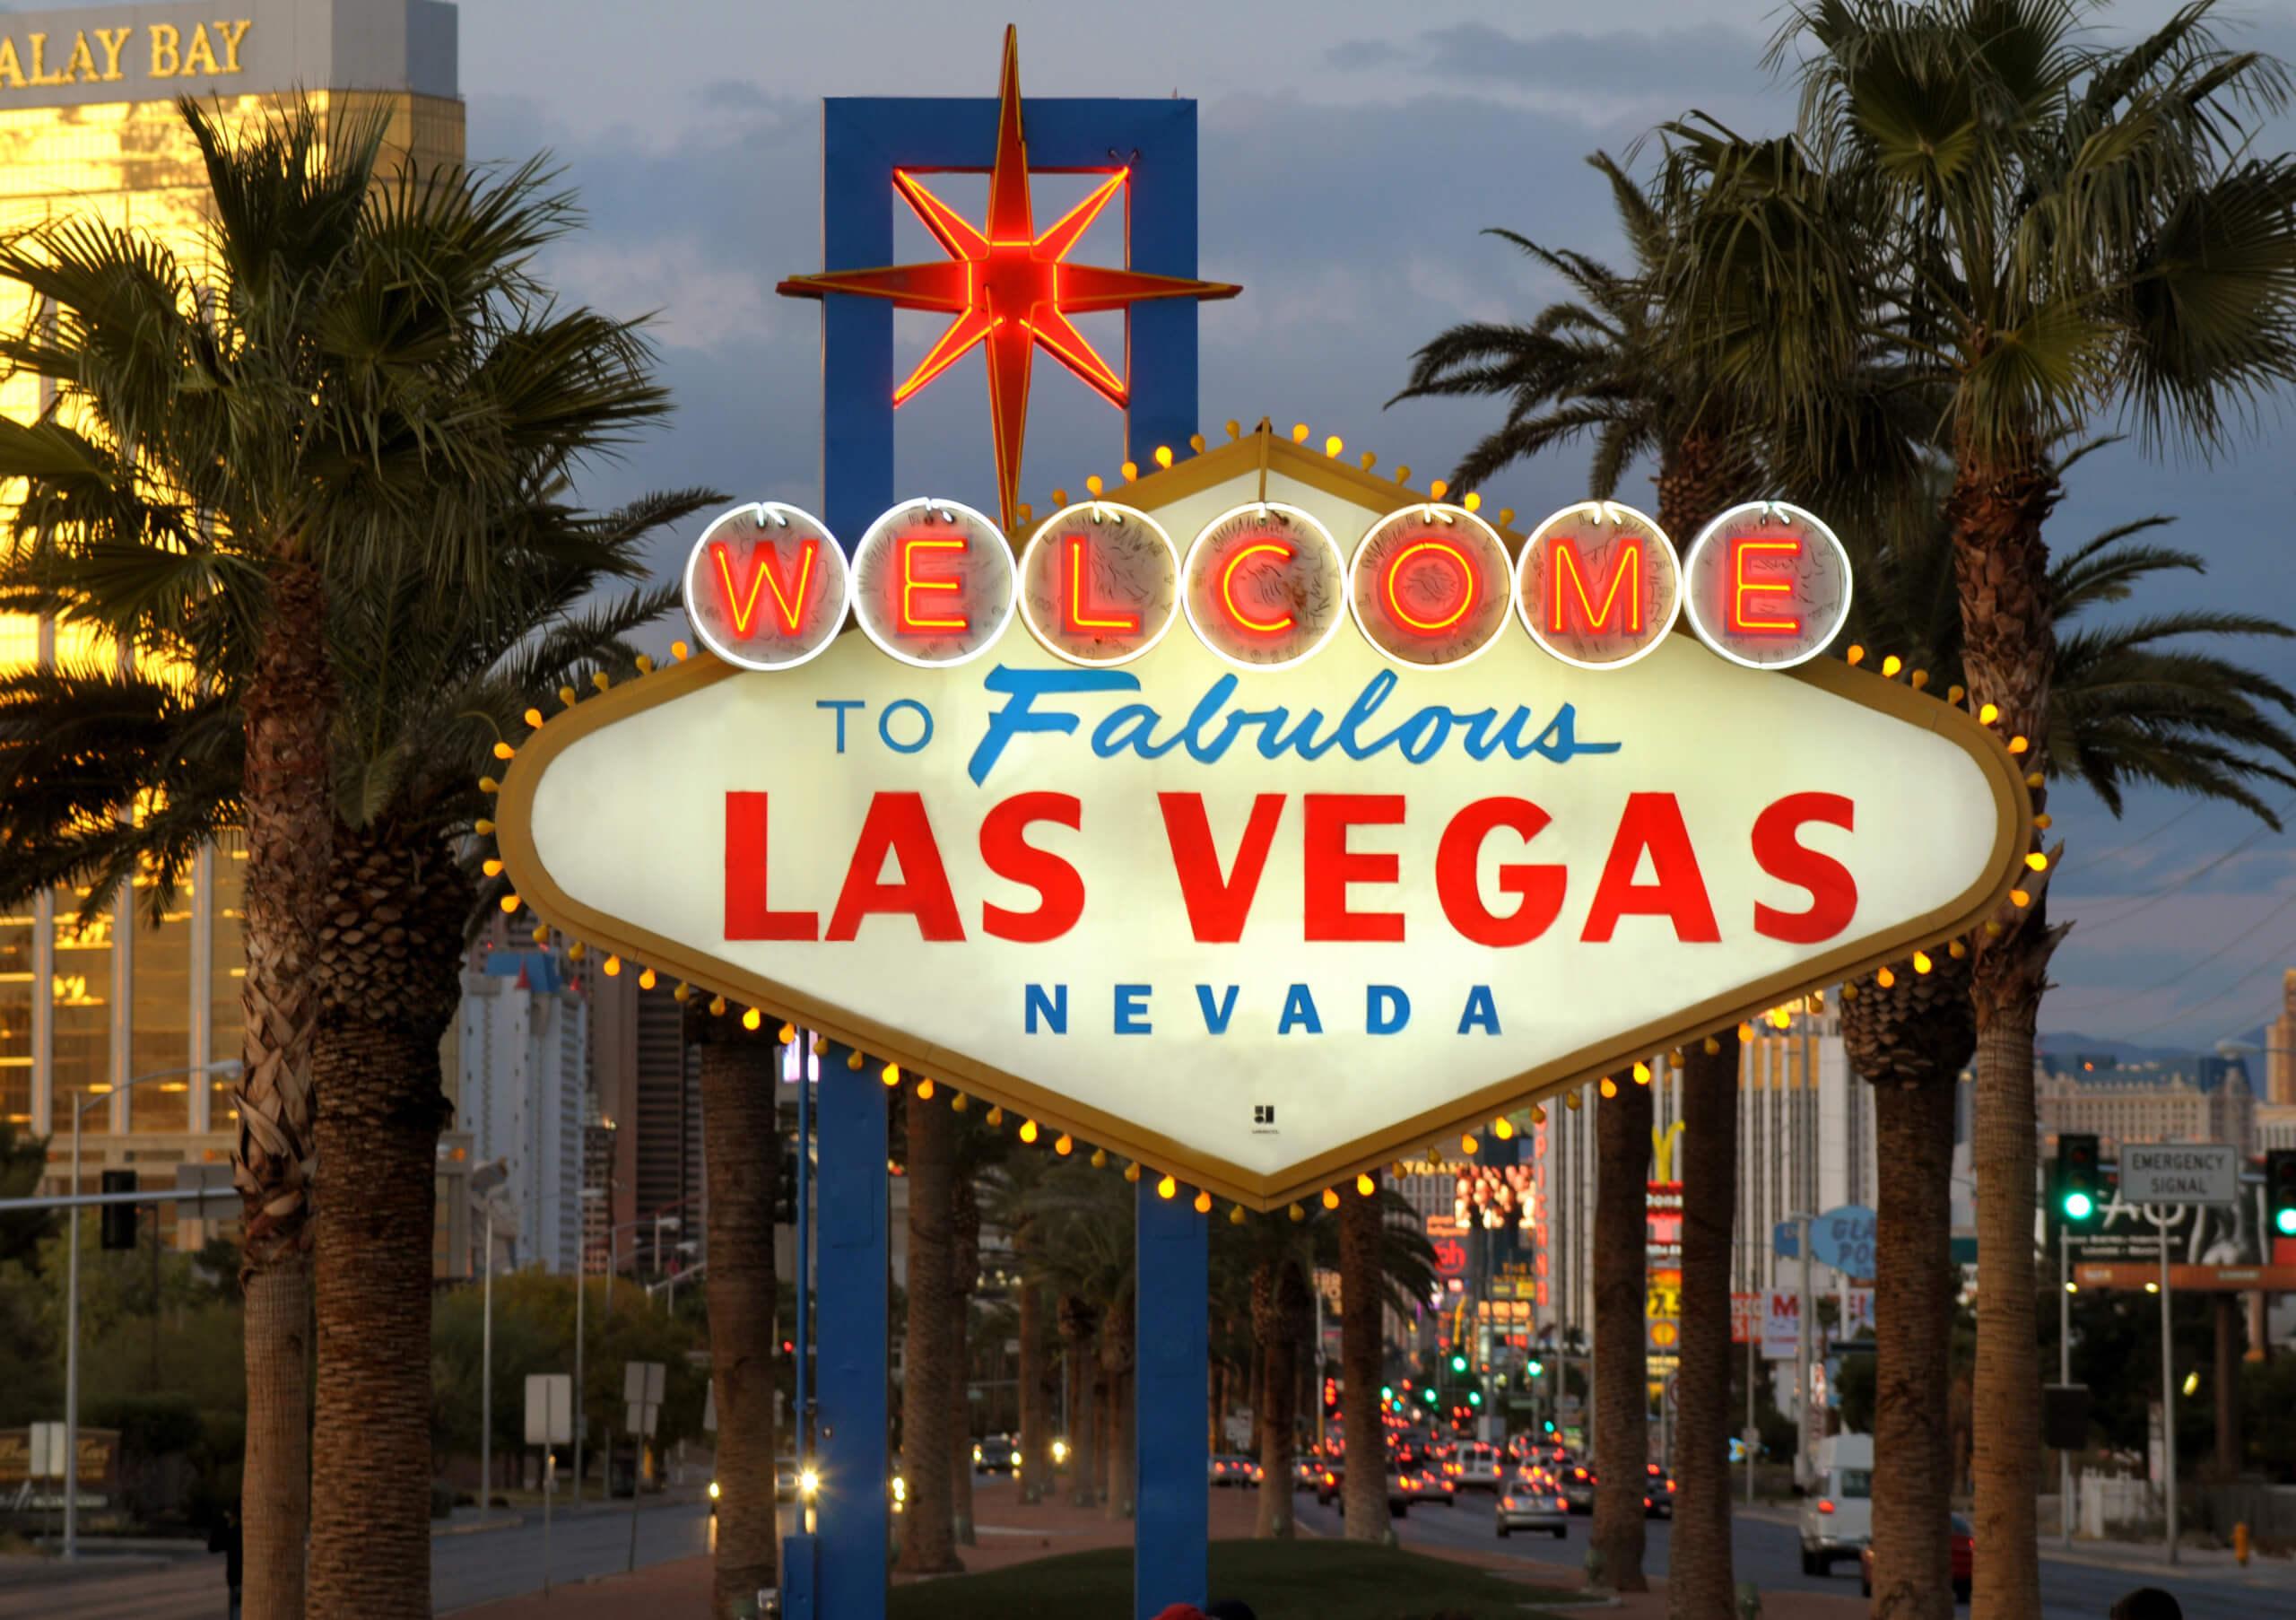 Welcome to Las Vegas sign on the Las Vegas Strip. 11/13/09